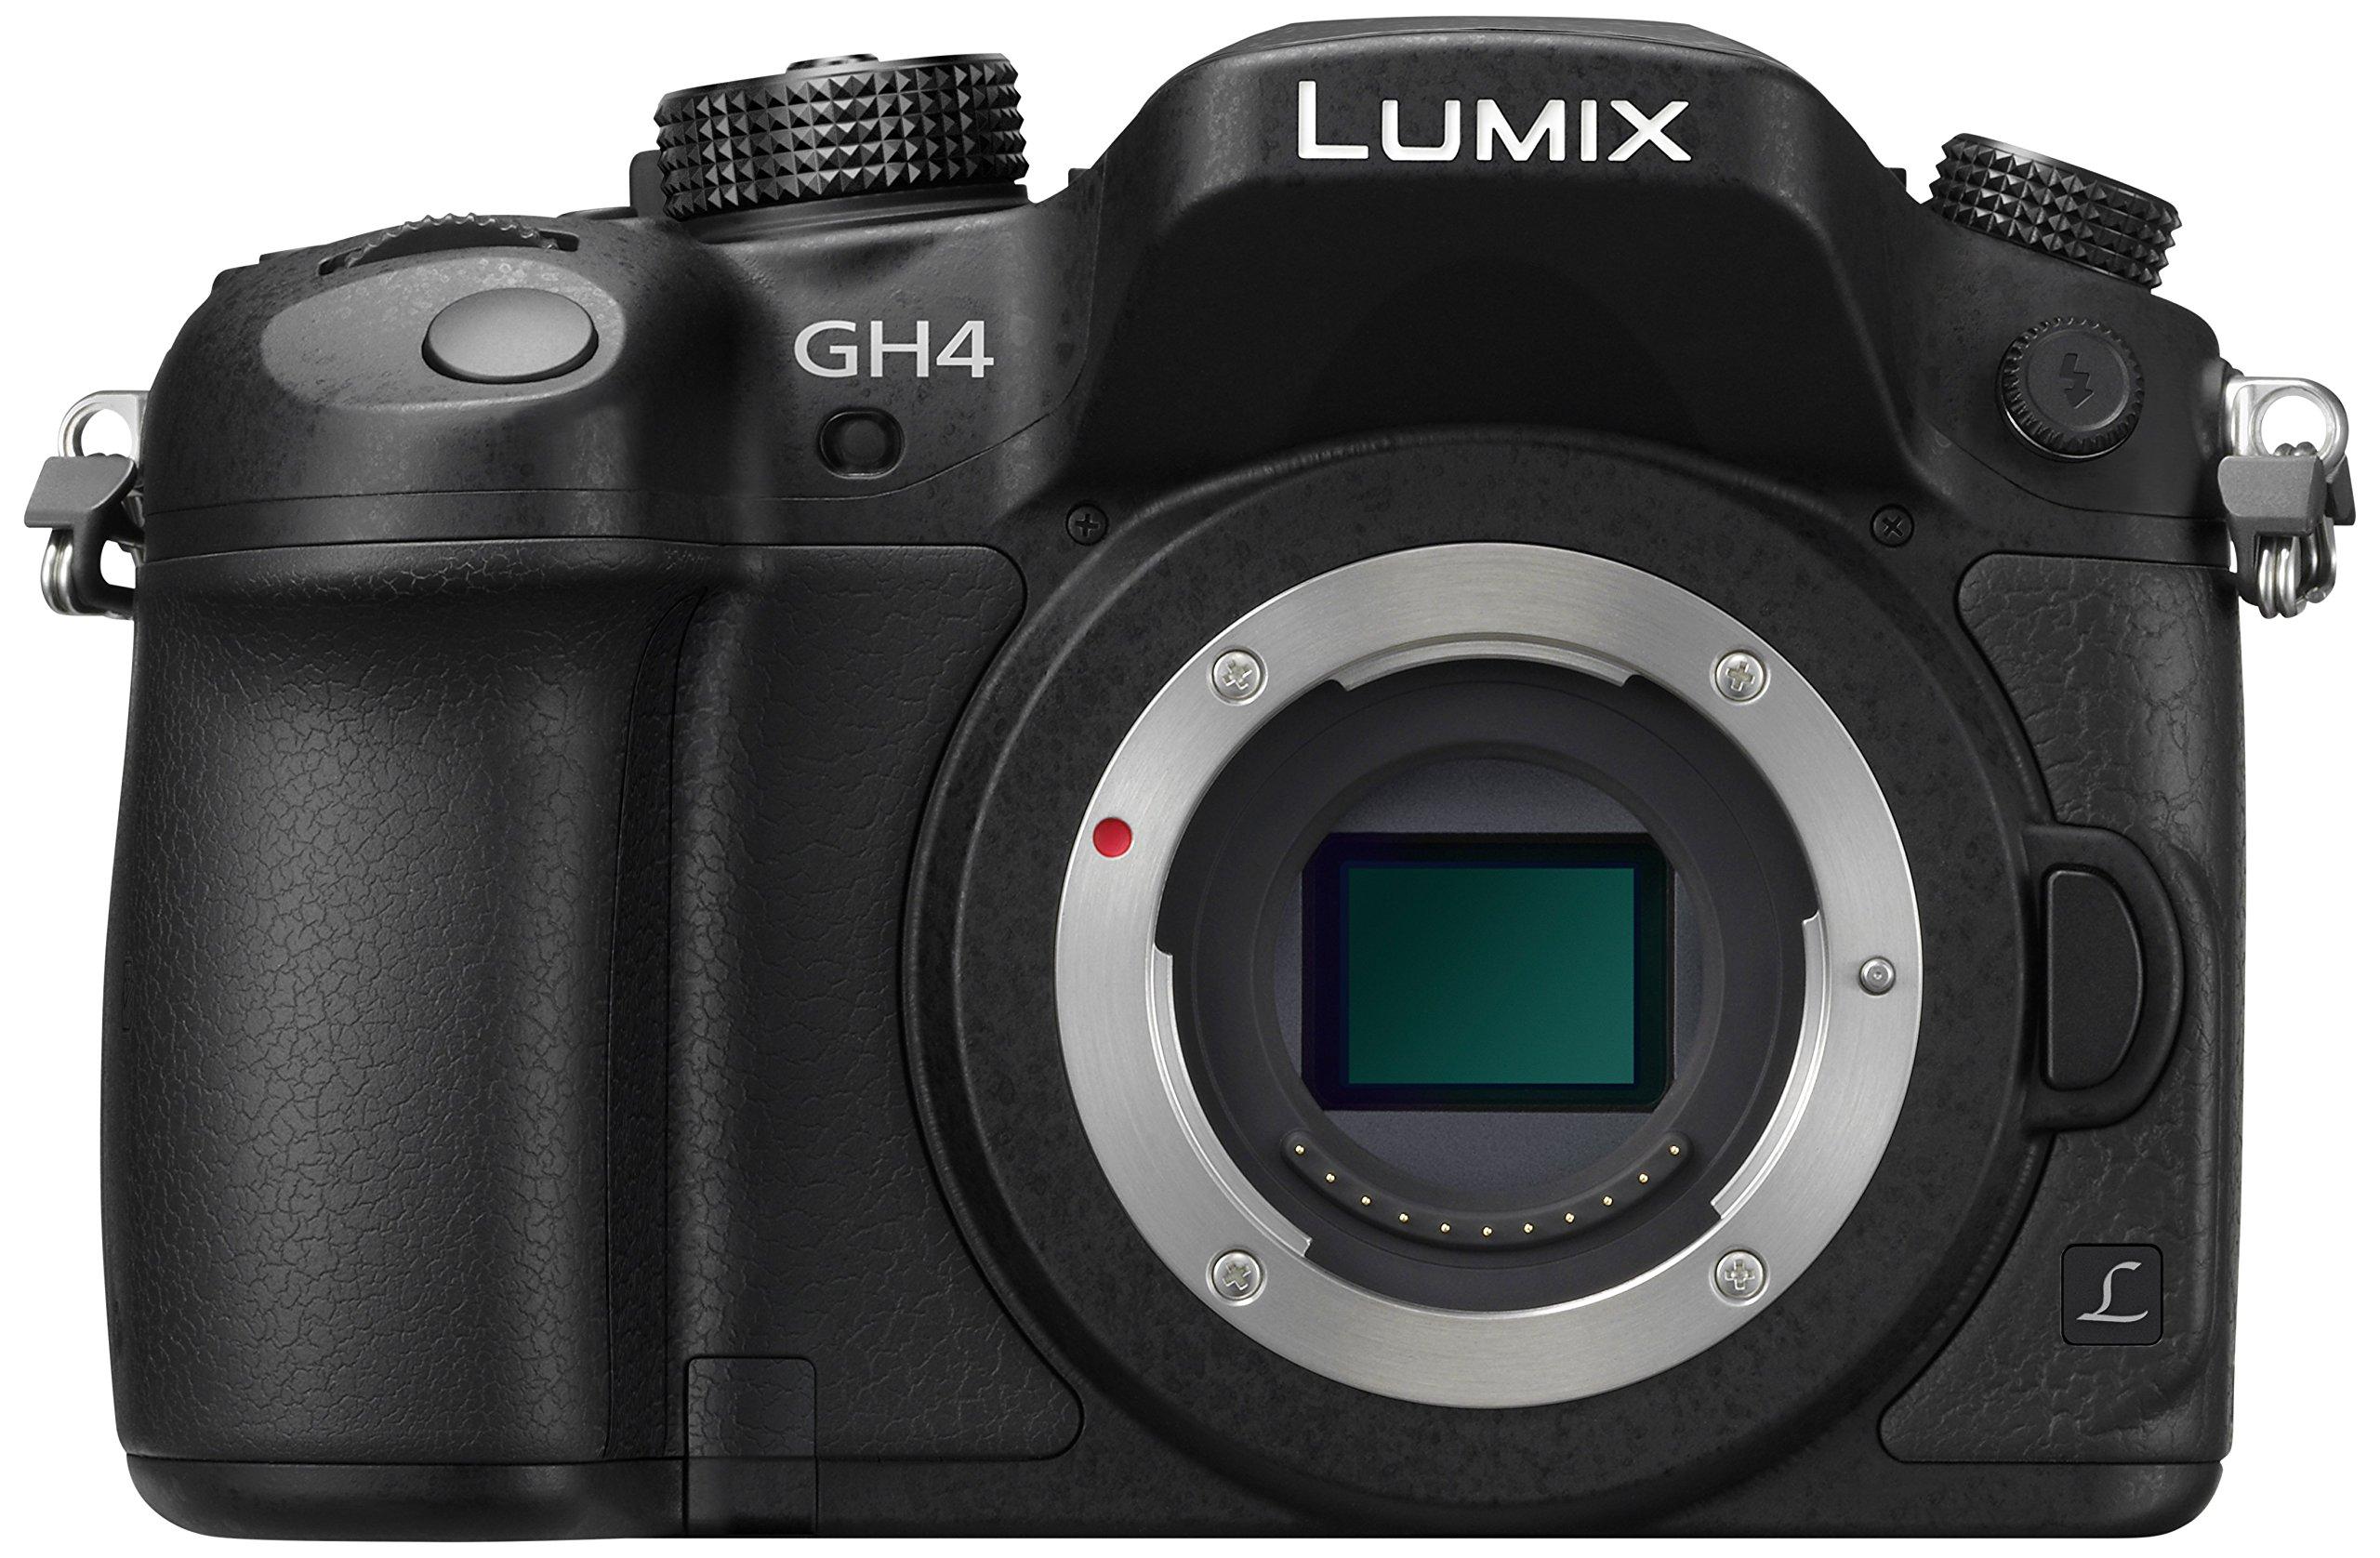 Panasonic Lumix DMC-GH4RE-K Fotocamera Mirrorless, Solo Corpo, 16 Megapixel, Schermo Touchscreen OLED, Wi-Fi, NFC, Nero product image